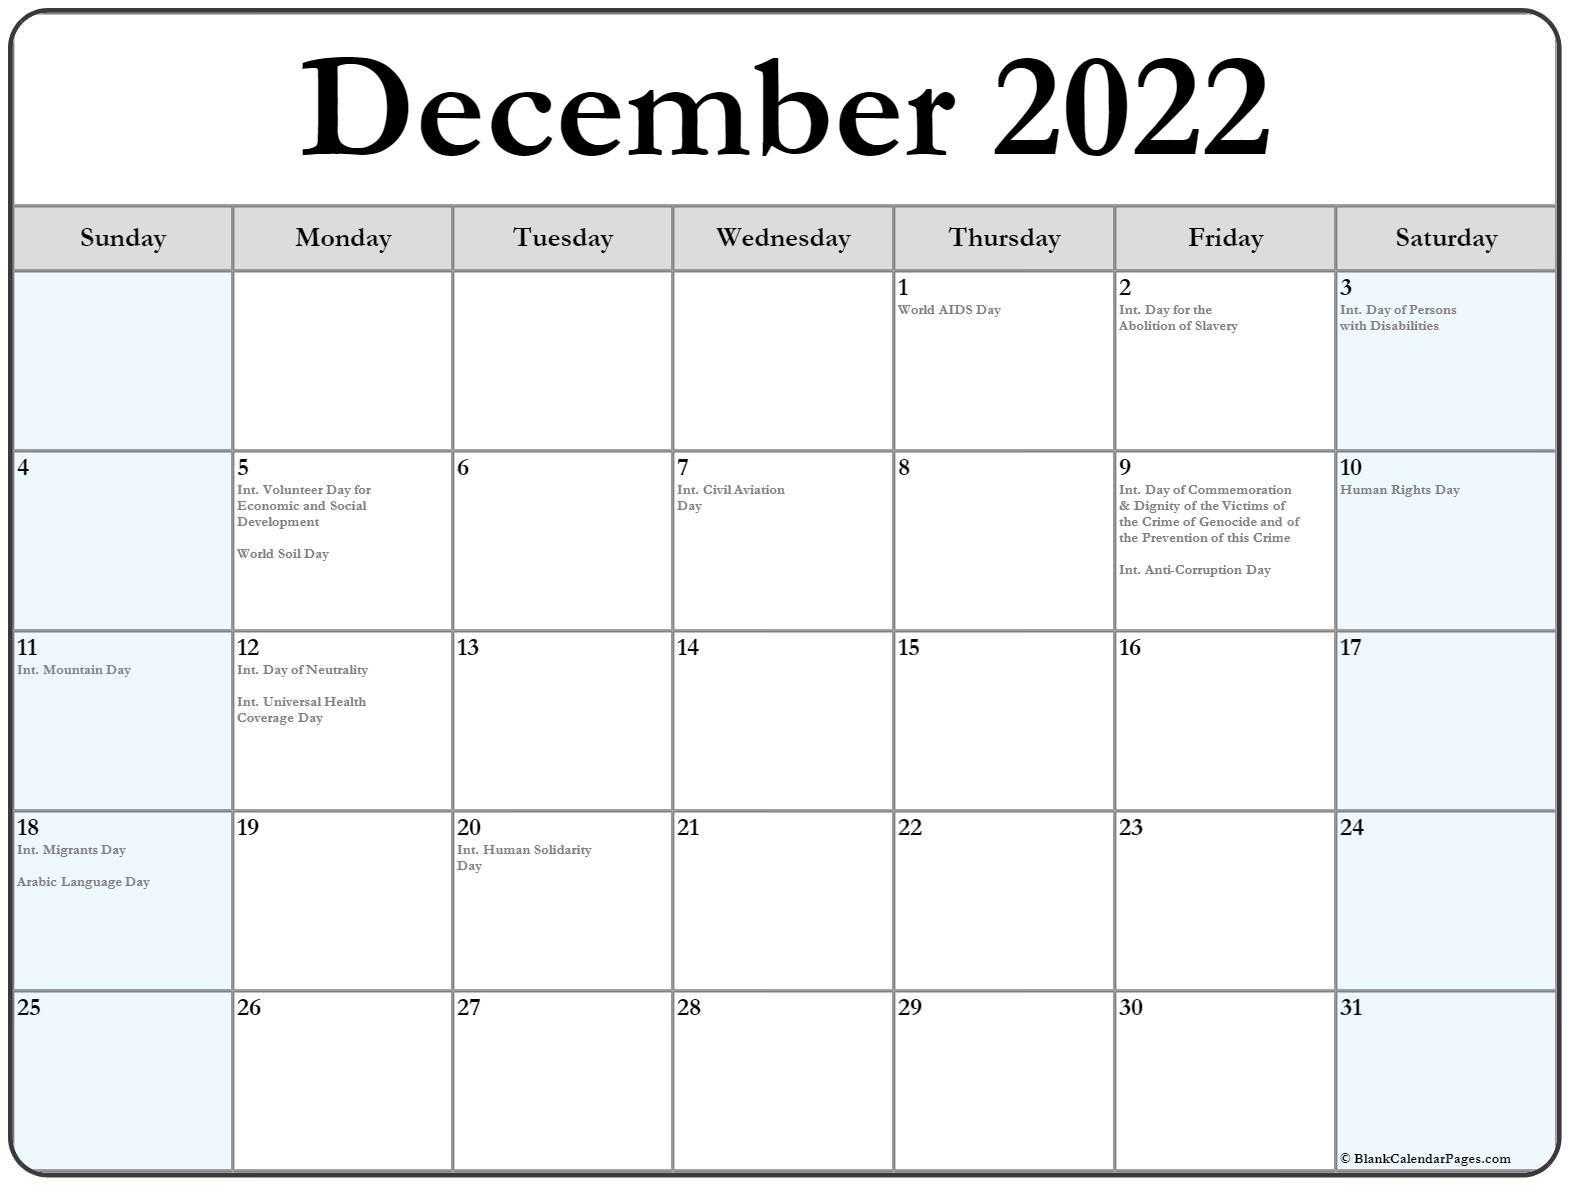 December 2018 calendar with international holidays